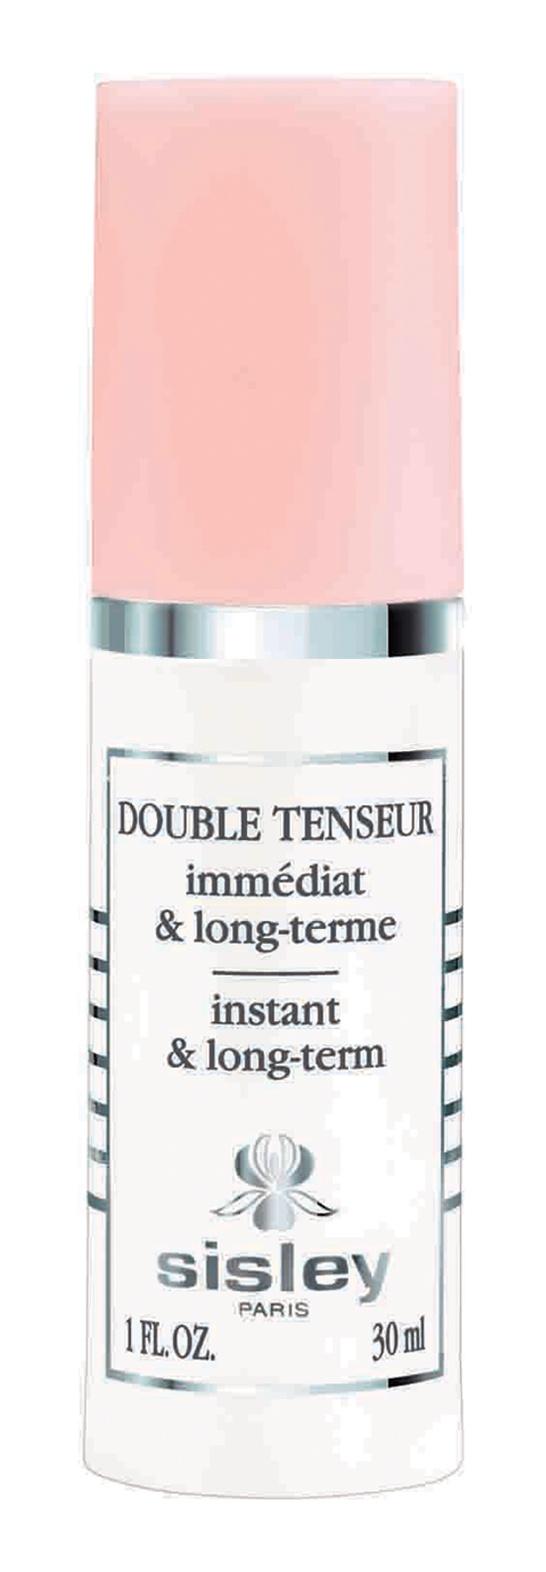 Sisley Double Tenseur